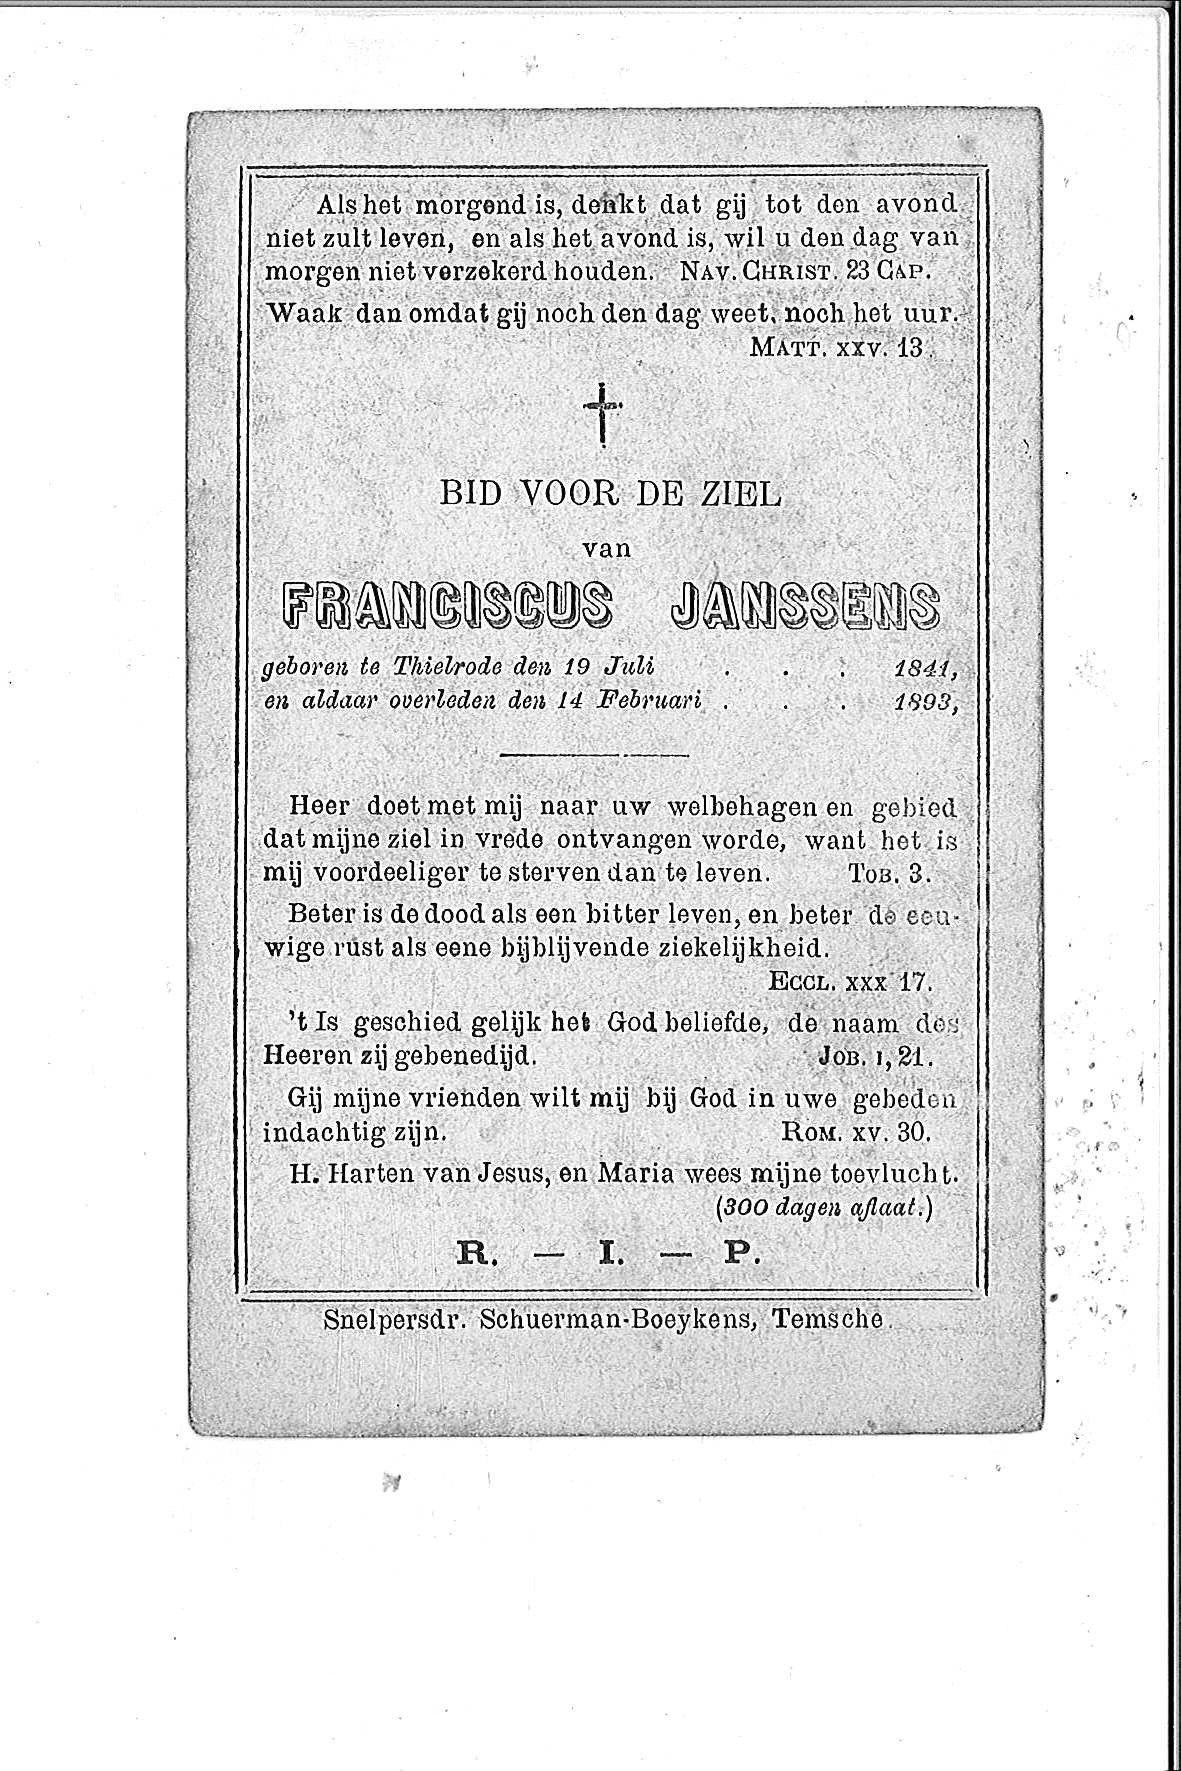 Franciscus(1893)20150330095309_00016.jpg